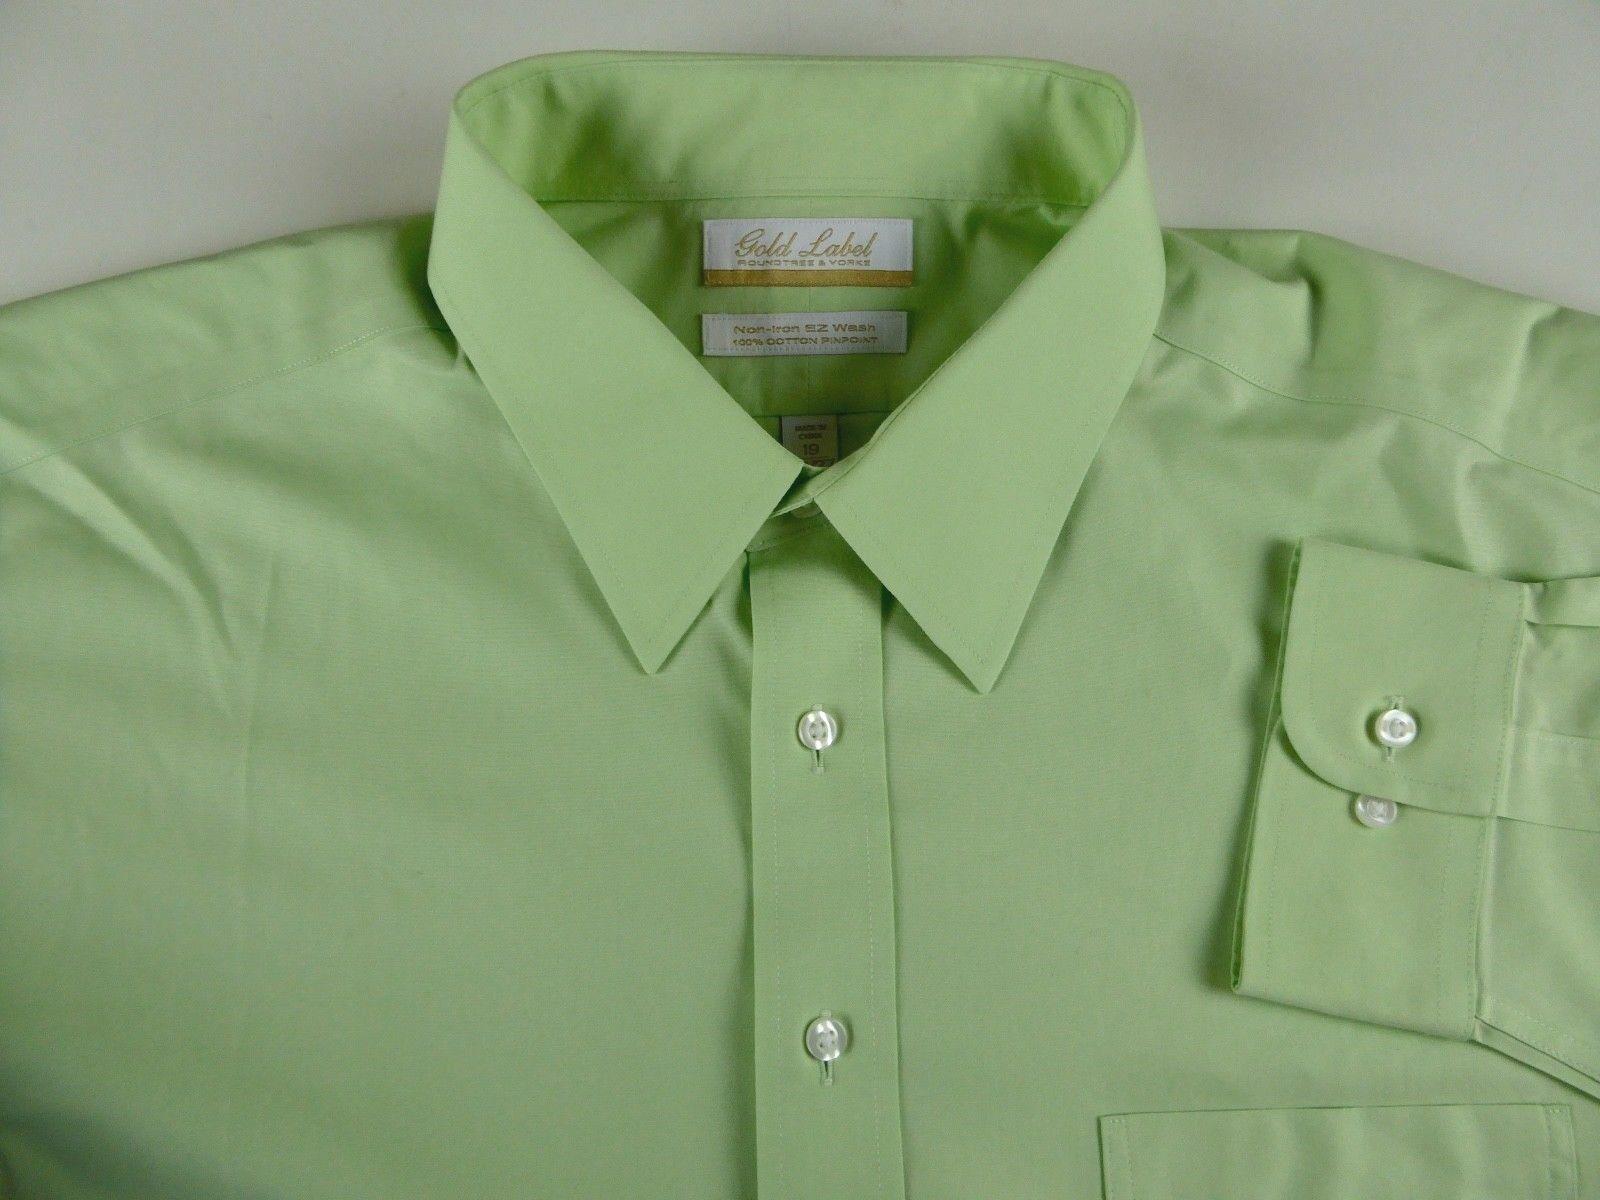 Roundtree & Yorke gold Label Non Iron EZ Wash Dress Shirt NWT 75 Pinpoint Cotton